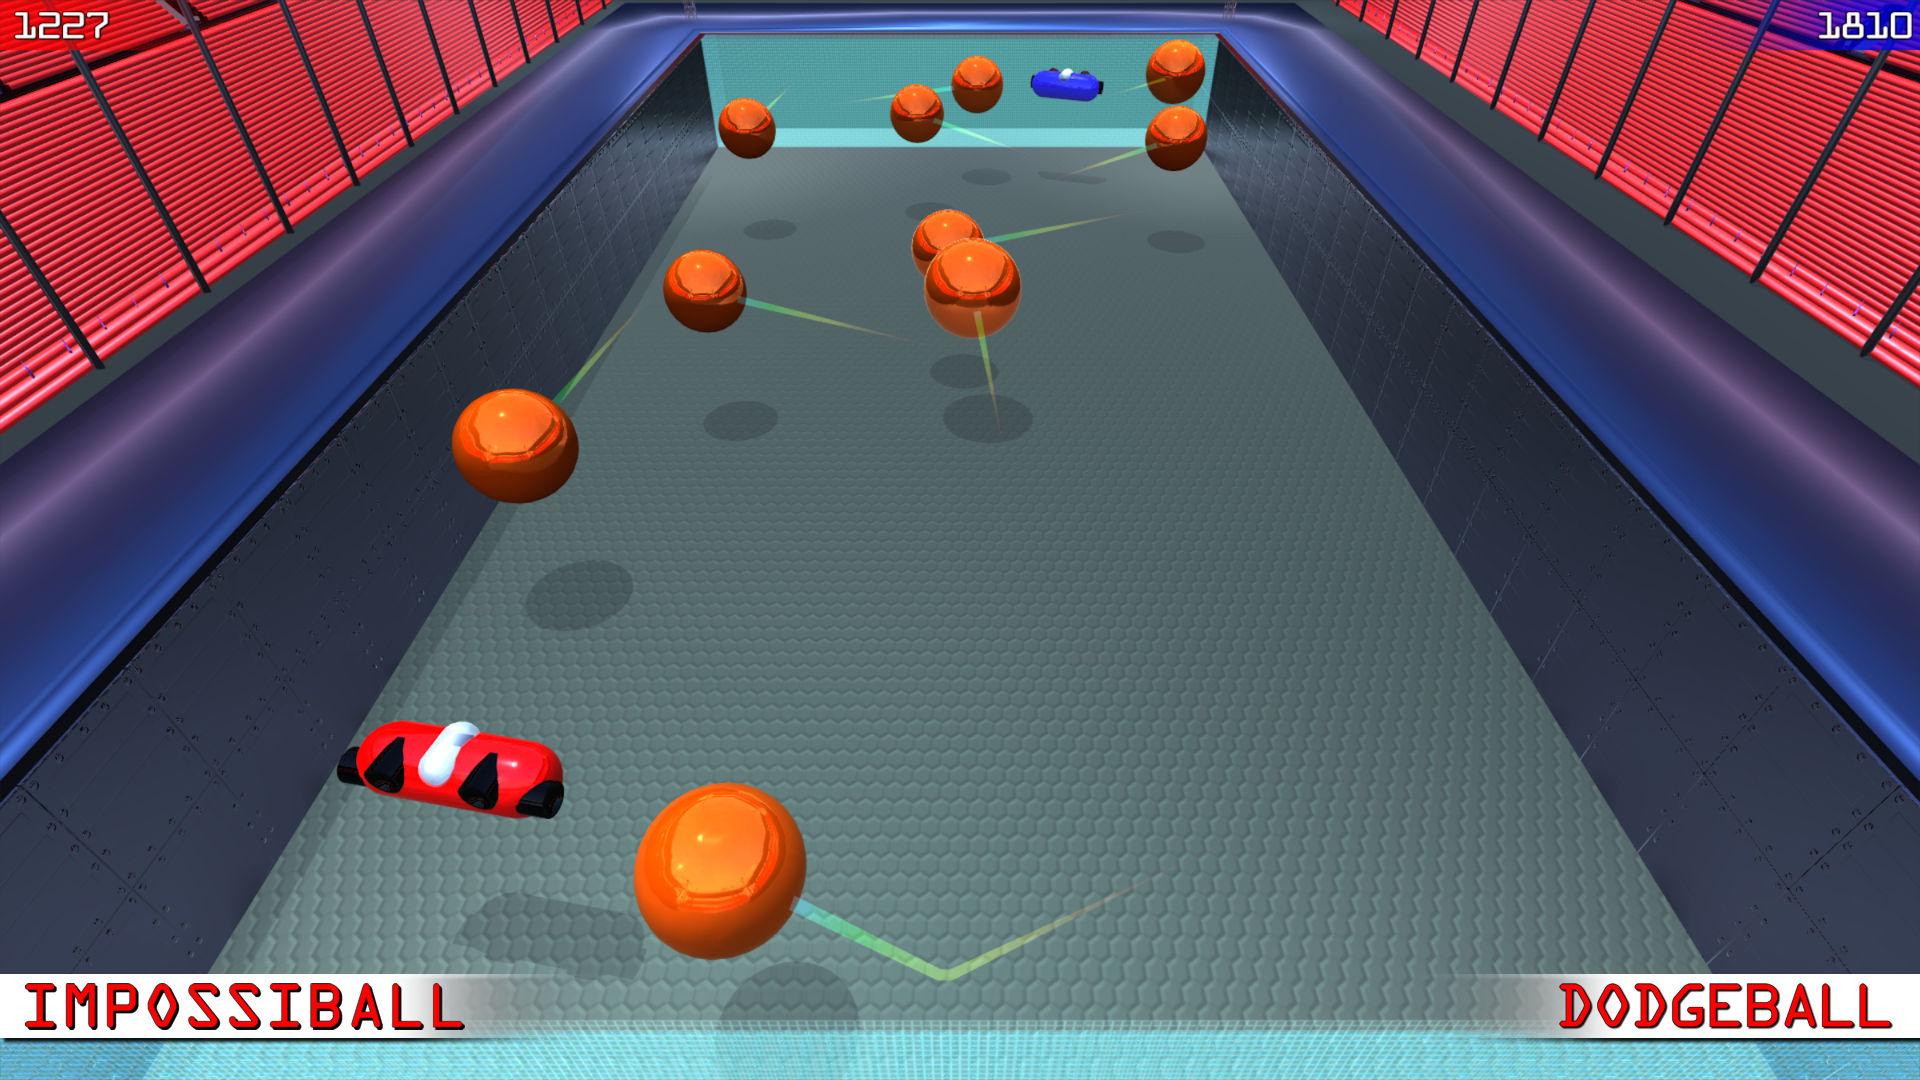 Dodgeball in Impossiball